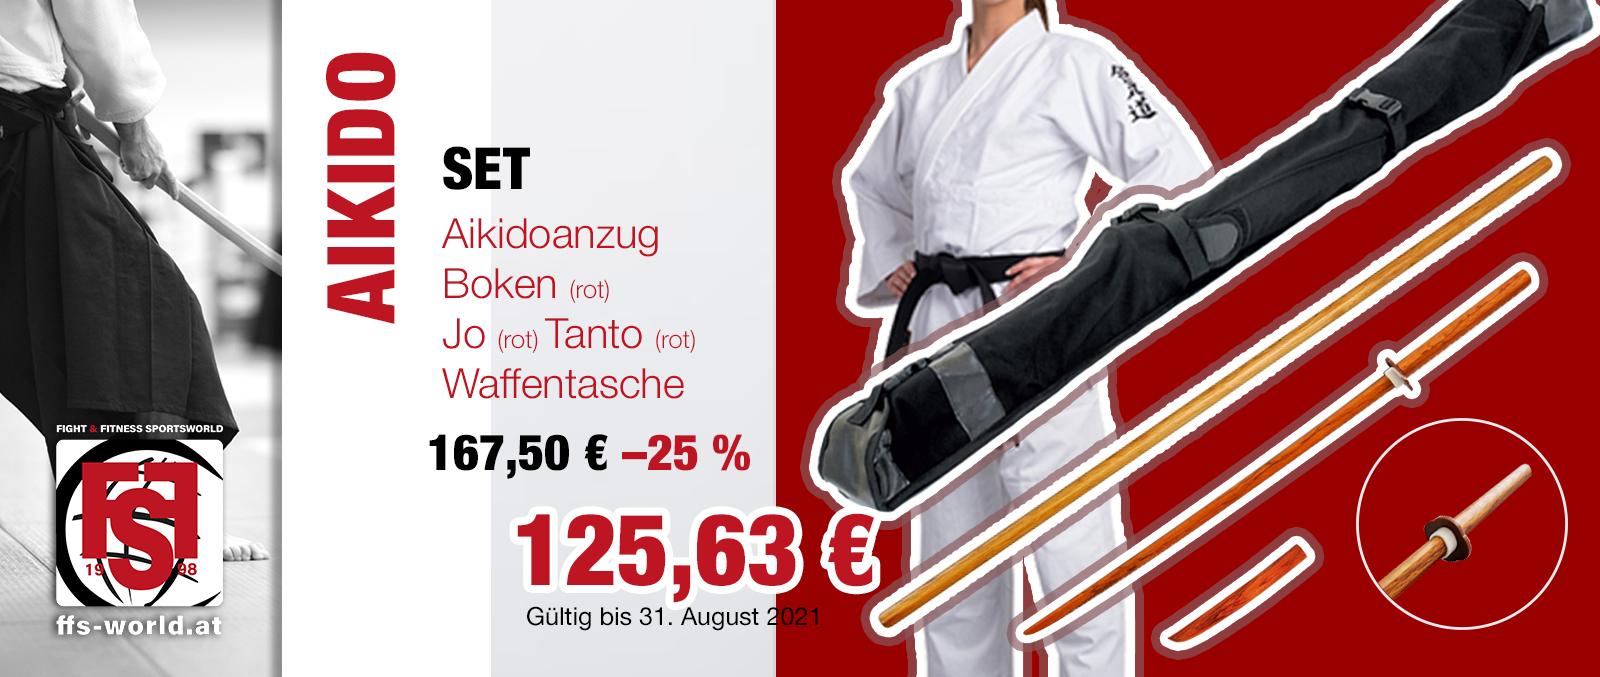 Aikido Set